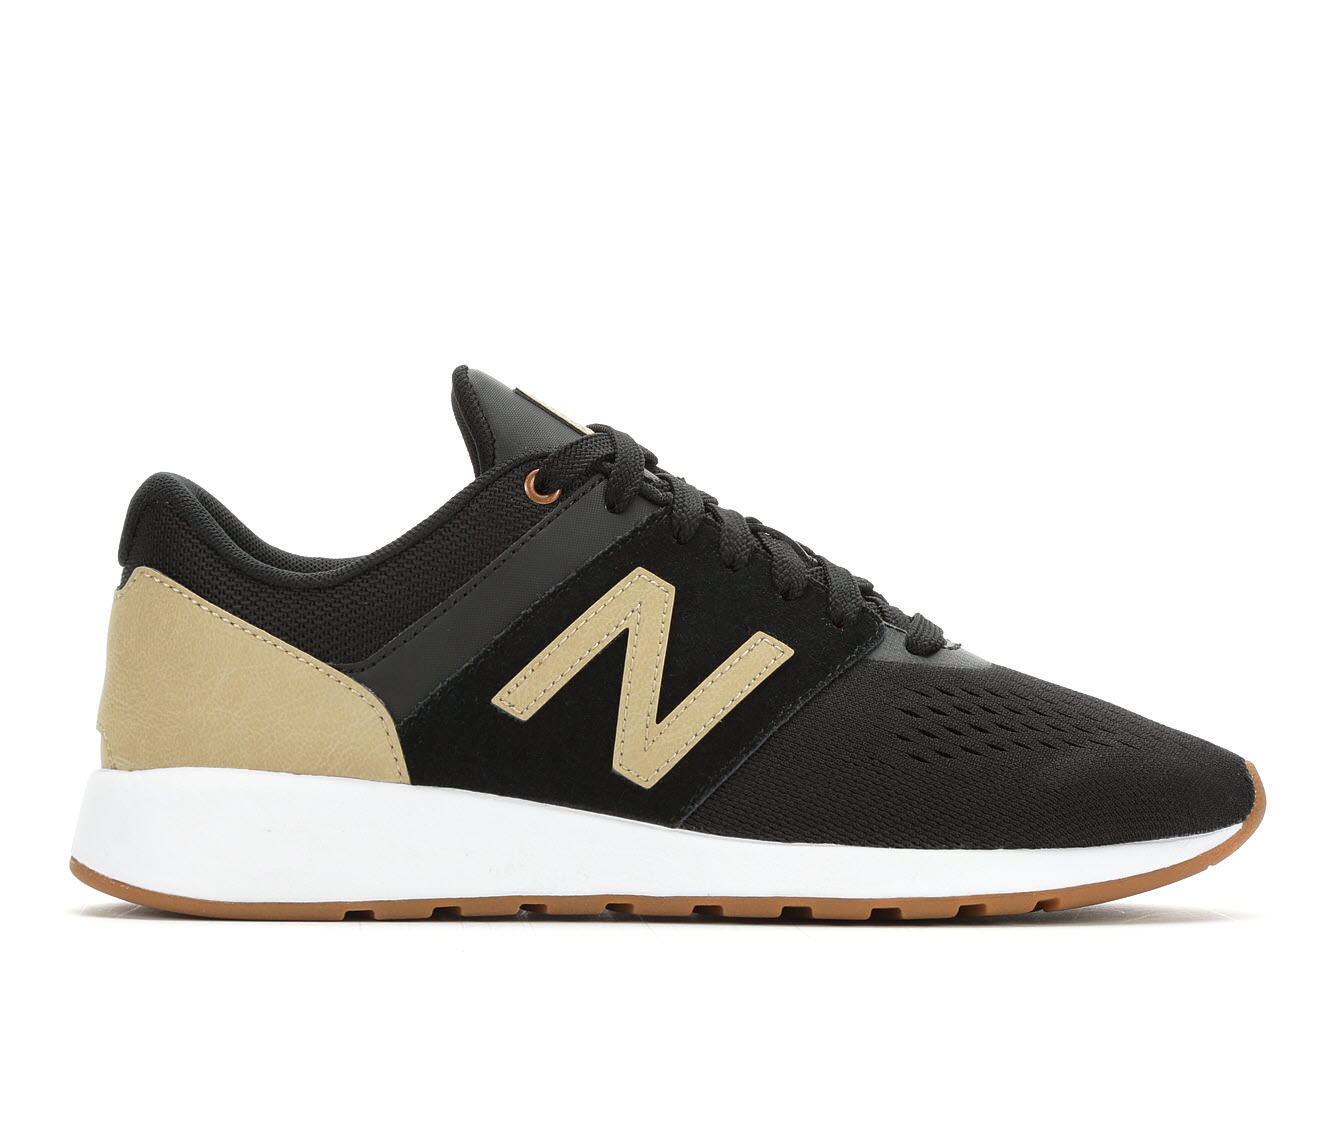 Women's New Balance WRL24V1 Retro Sneakers Black/Gold/Wht